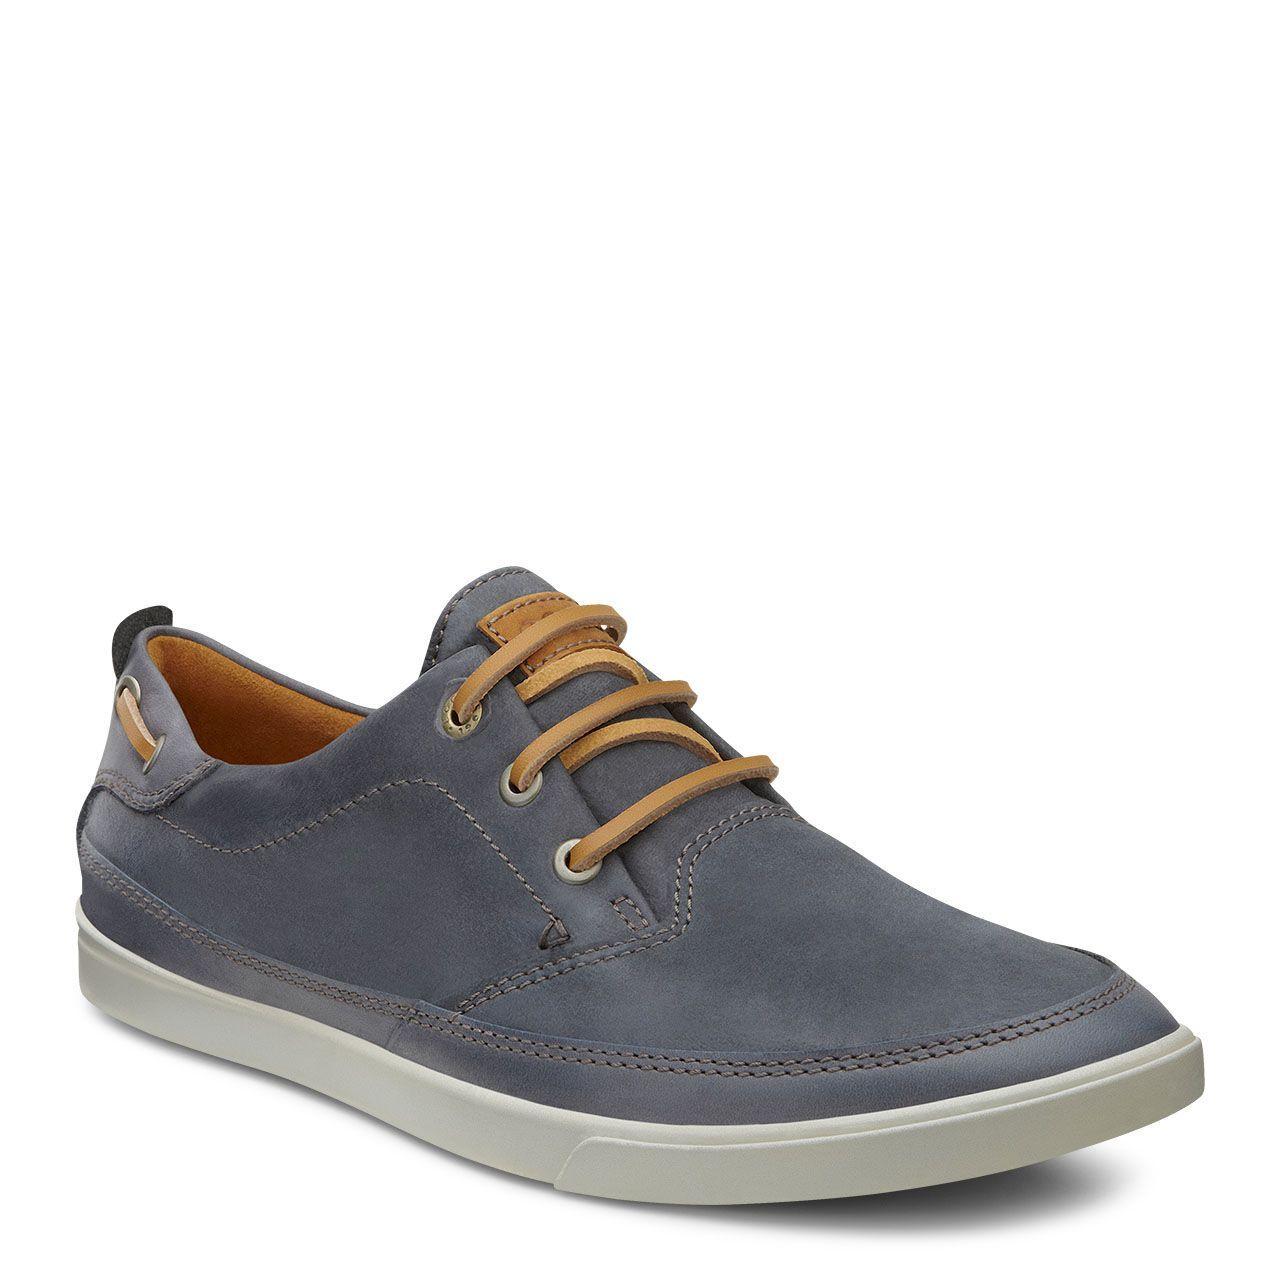 Mens Casual Shoes | ECCO USA